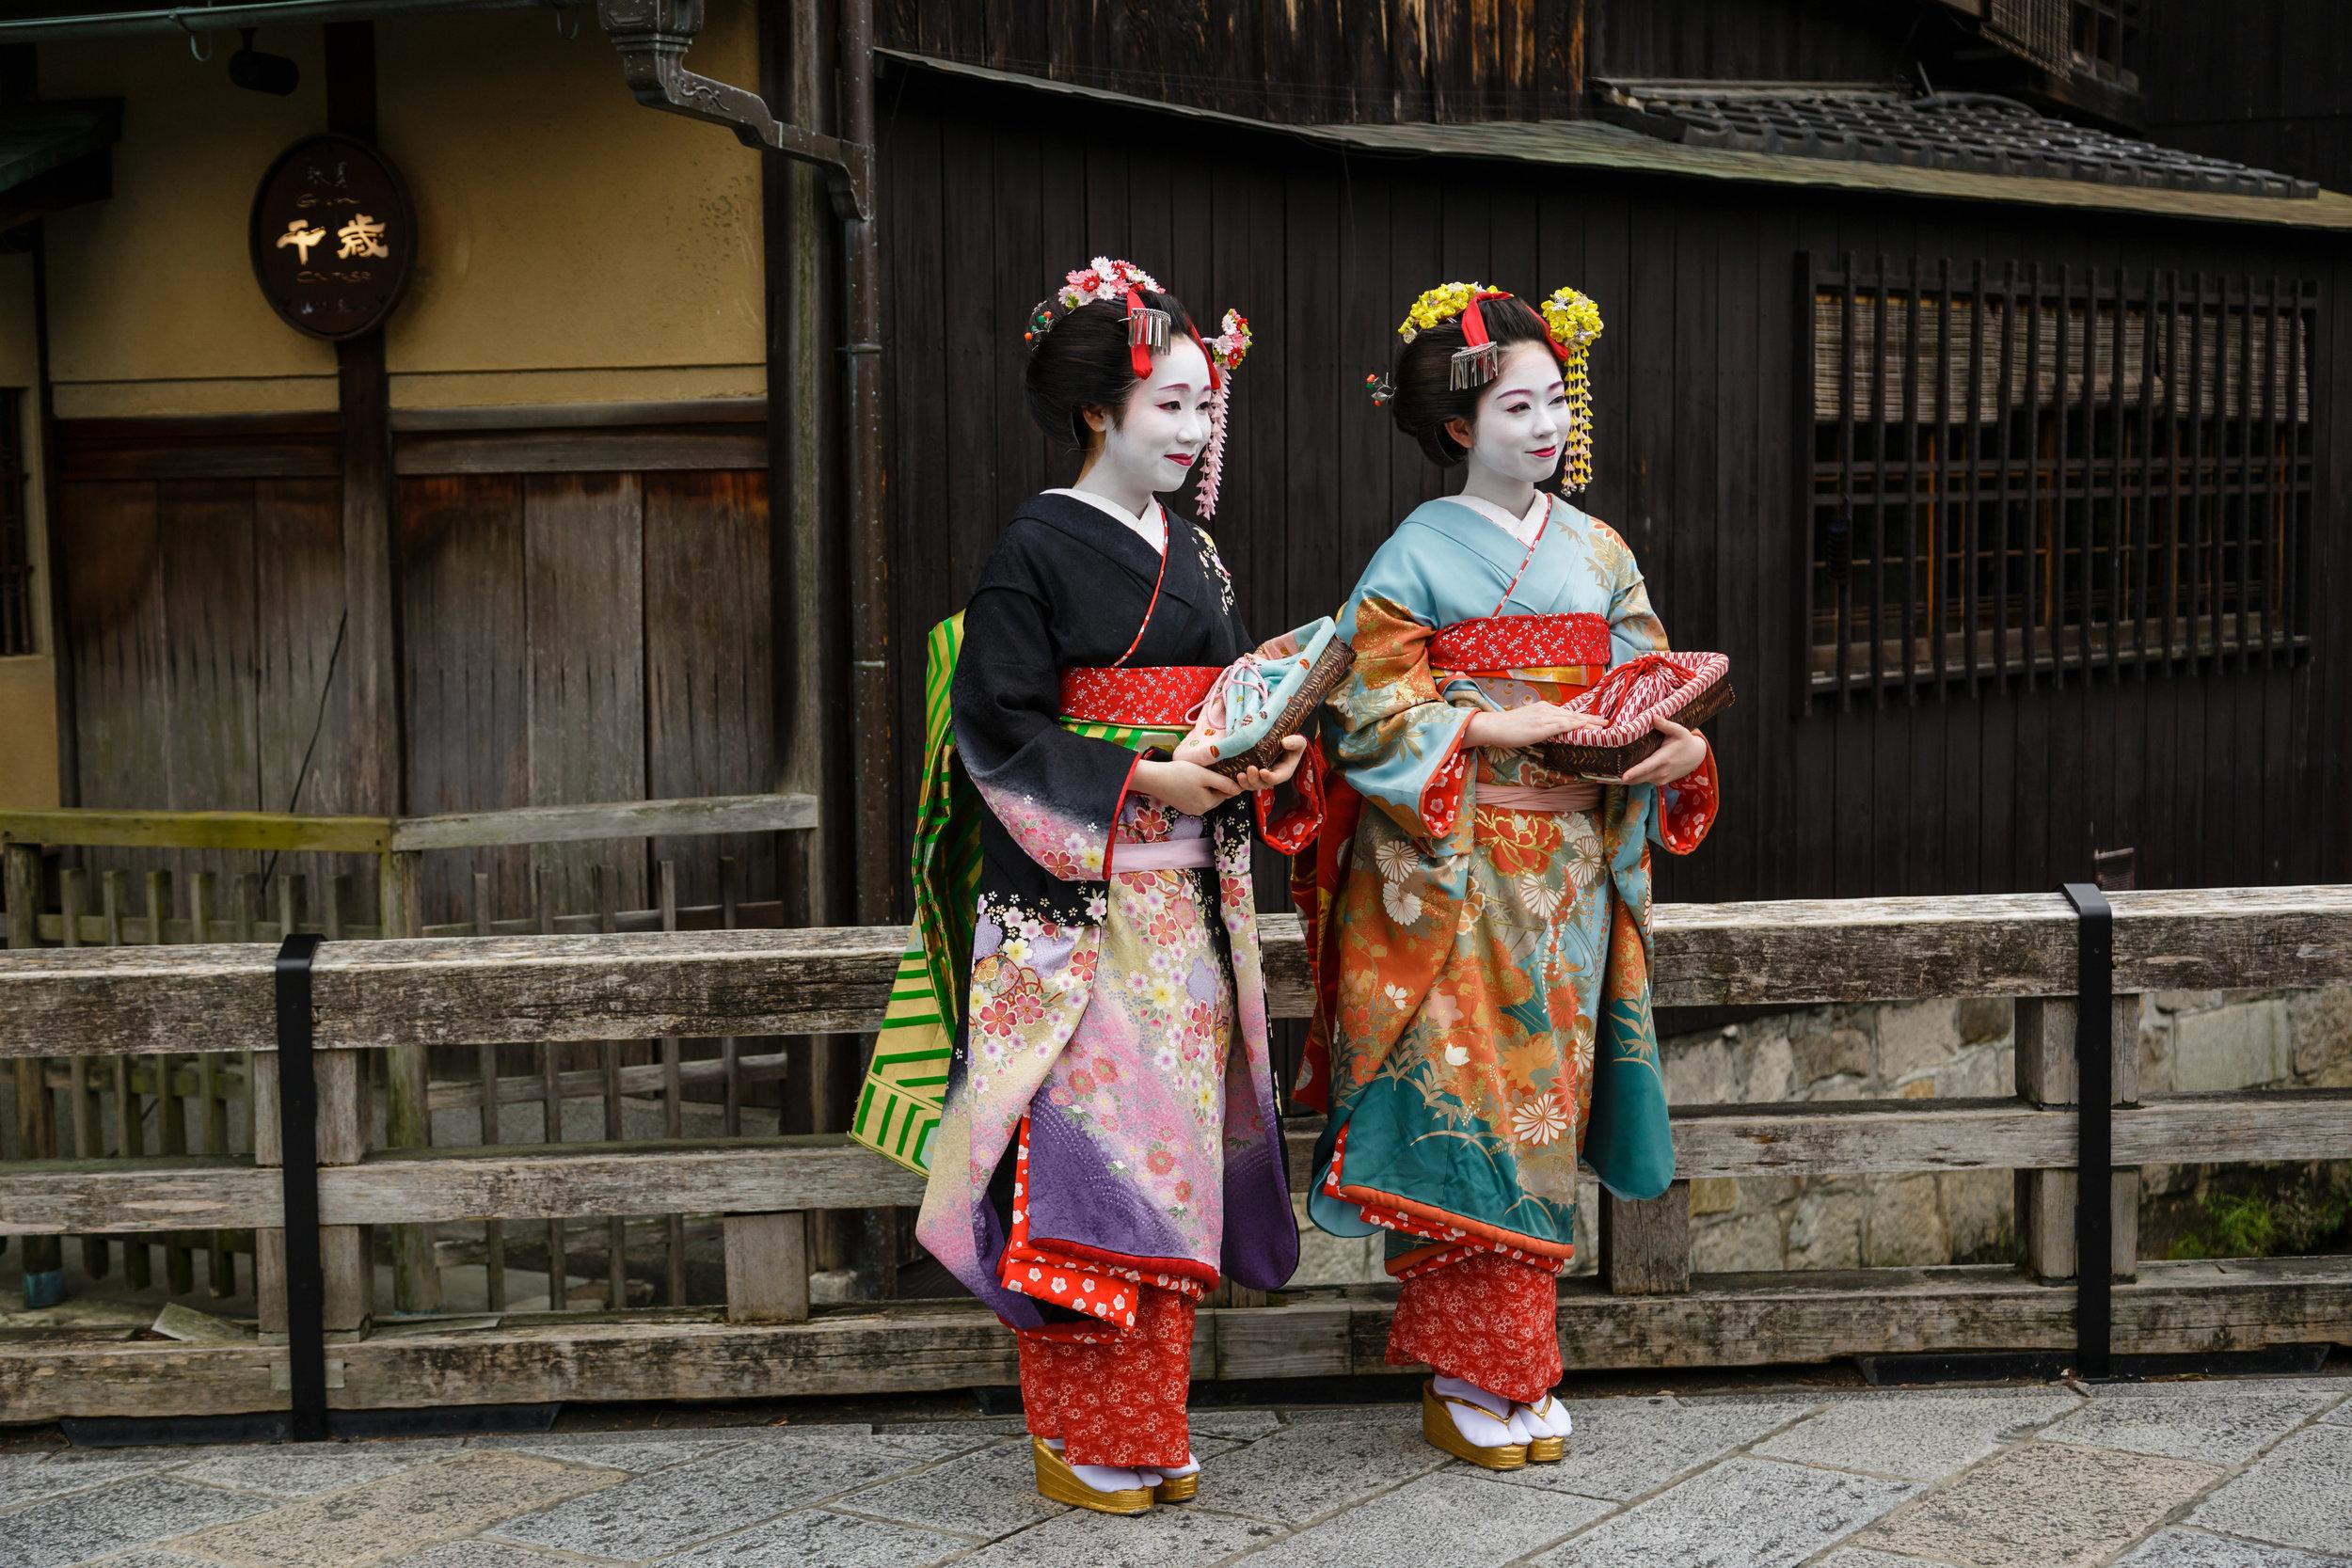 Geishas_in_Kyoto.jpg